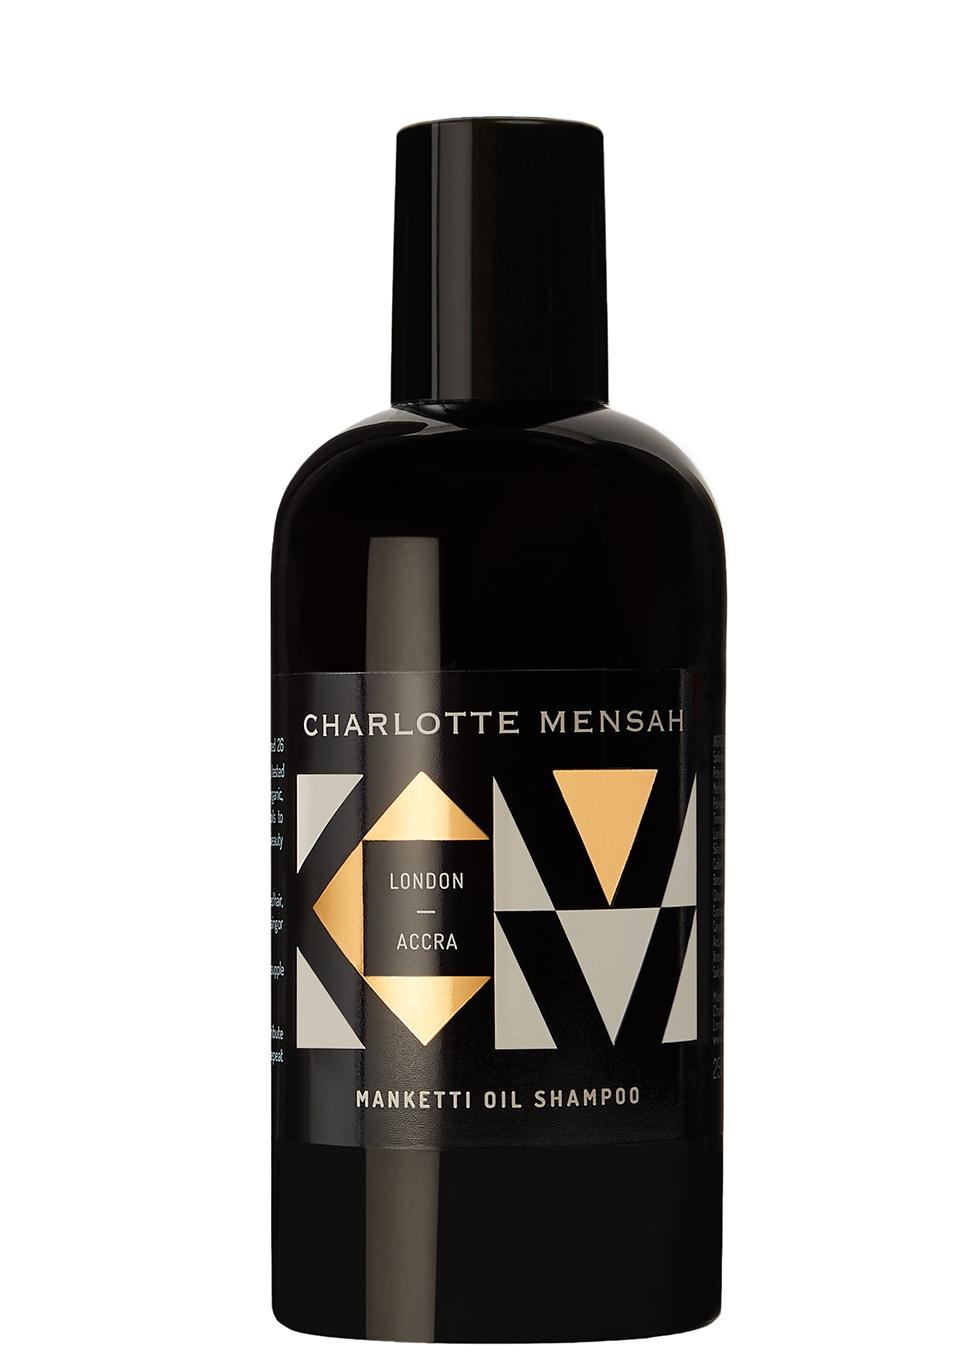 Manketti Oil Shampoo 250ml